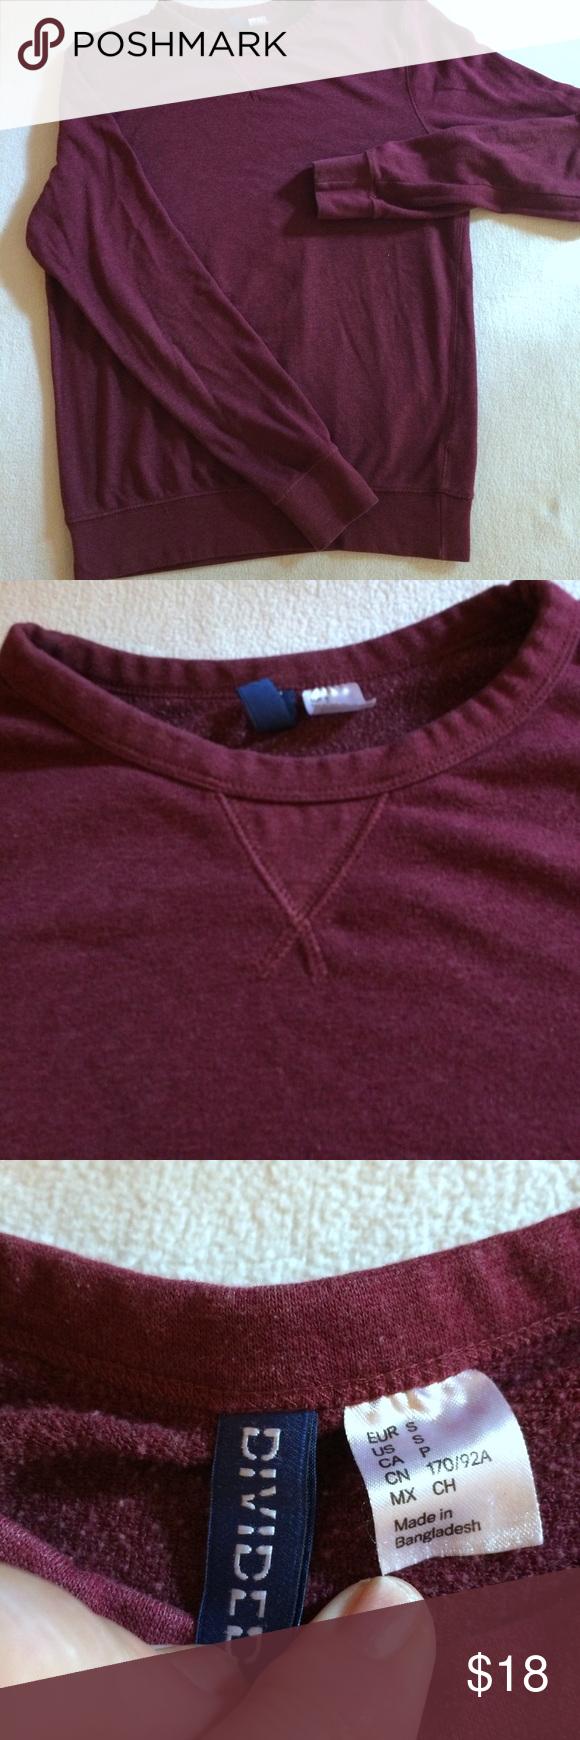 H M Divided Cranberry Sweatshirt S Long Sweatshirt Sweatshirt Shirt Sweatshirts [ 1740 x 580 Pixel ]